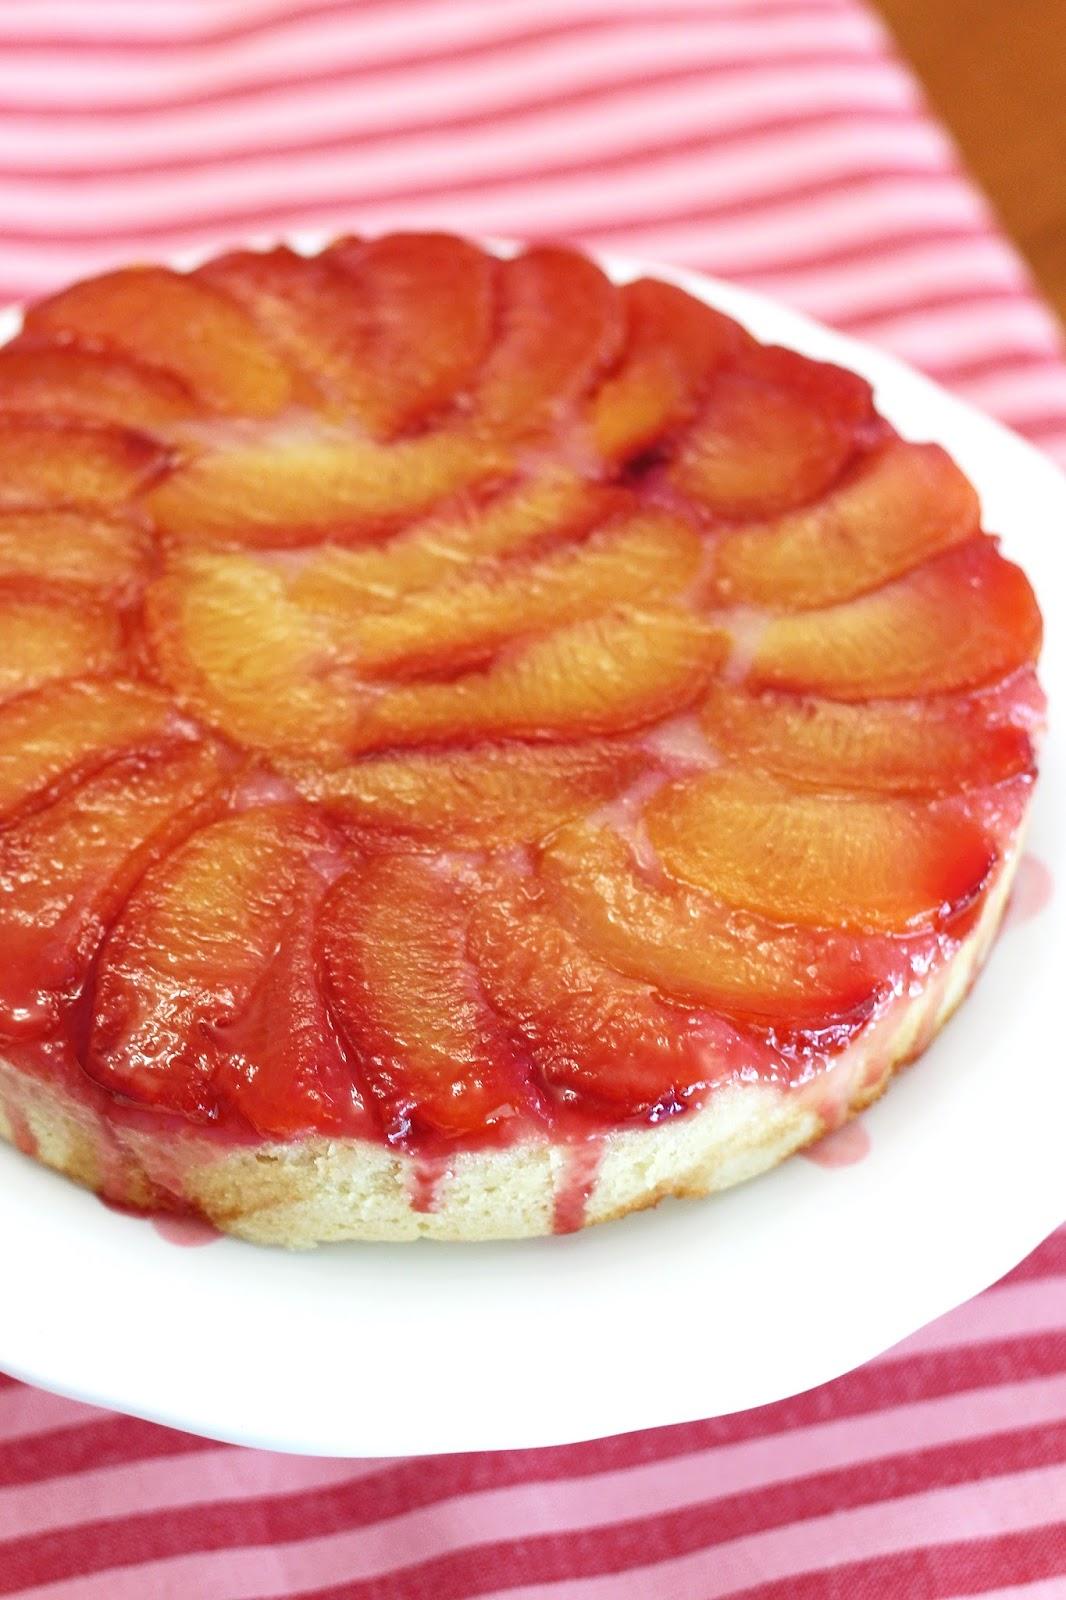 ... Bakes Gluten Free Treats: gluten free vegan plum upside down cake